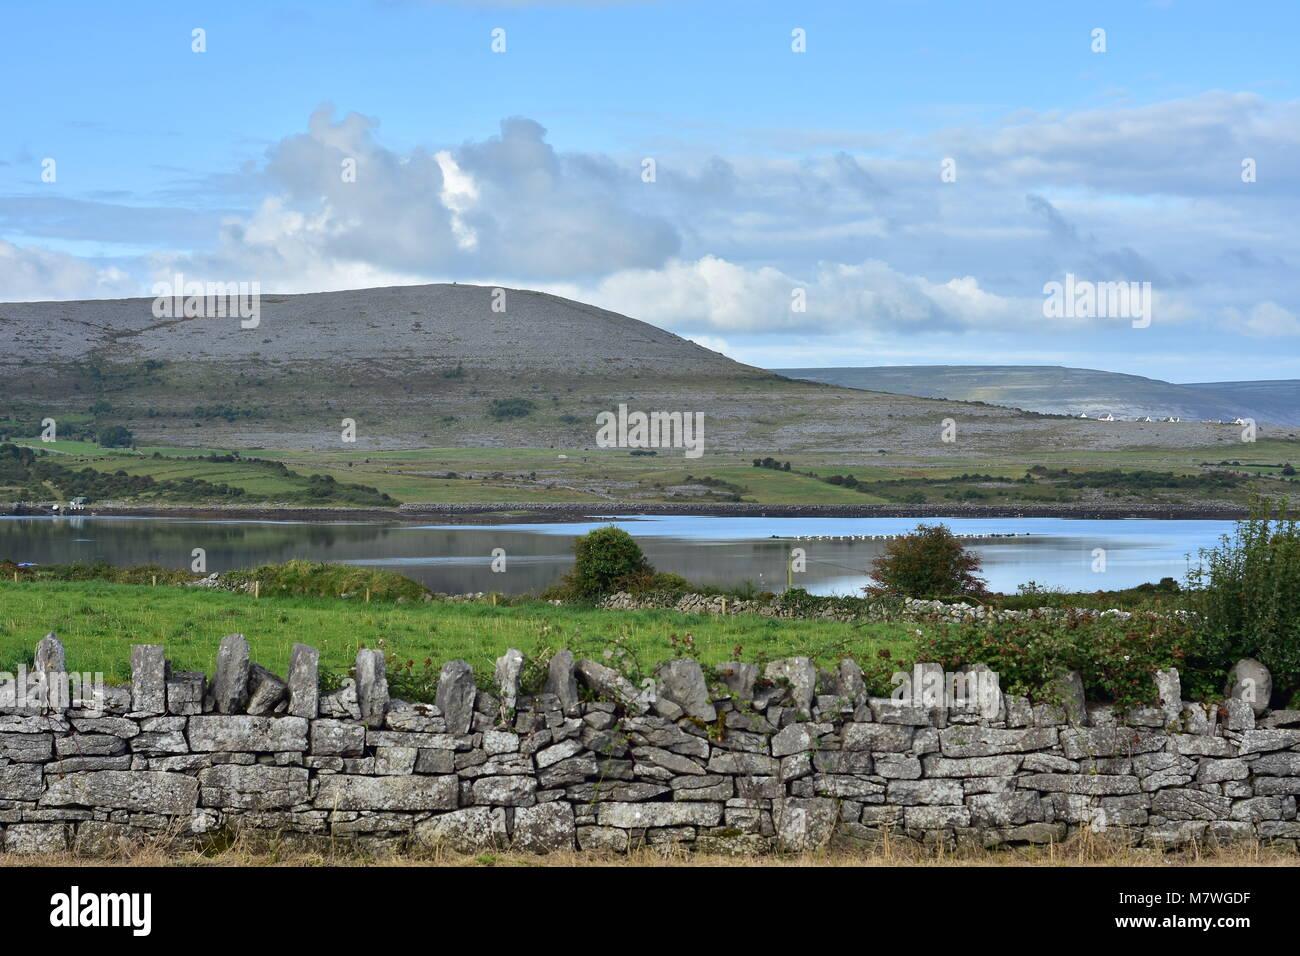 Karst landscape of Burren Plateau around Bell Harbour in western Ireland. - Stock Image